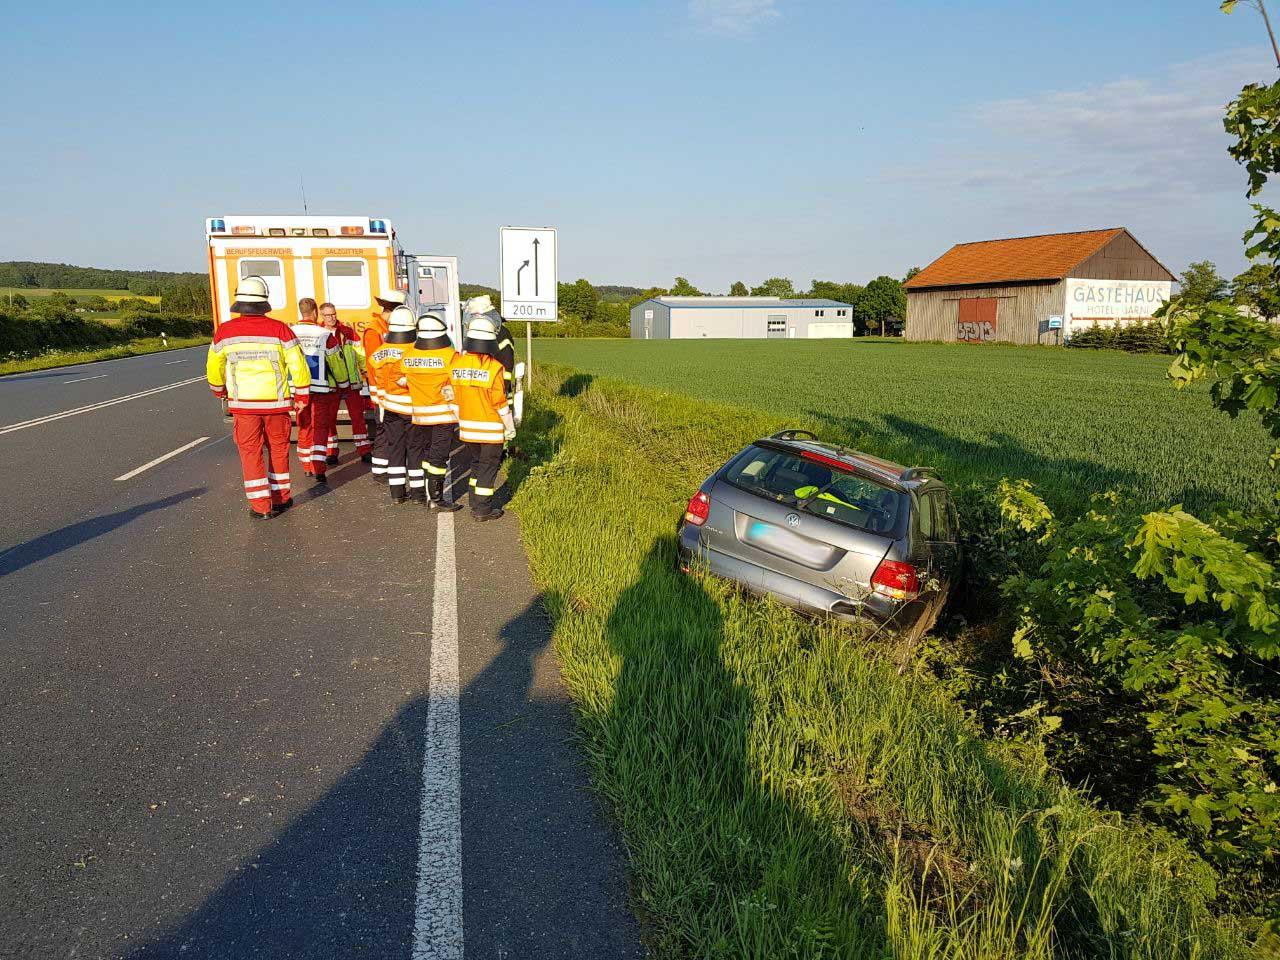 Alarm VU1 Bundesstraße 6 Fahrtrichtung Baddeckenstedt nach Haverlah